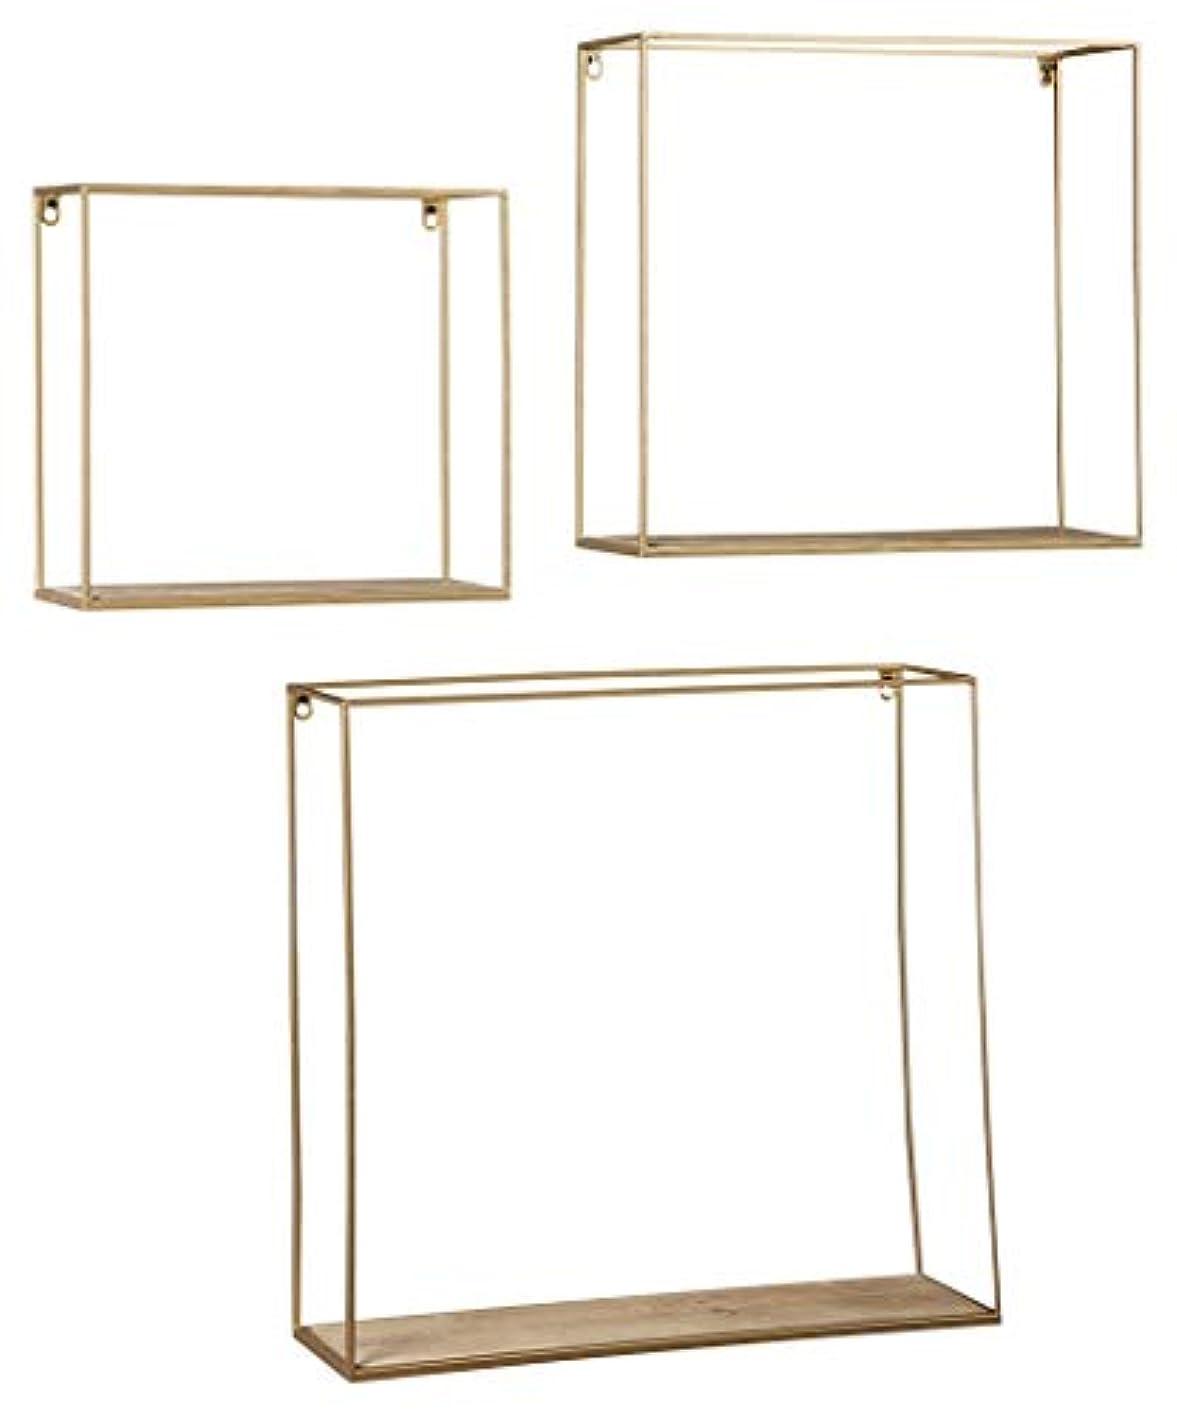 Signature Design by Ashley Efharis ((3 Piece) Wall Shelf Set, Natural/Gold Finish